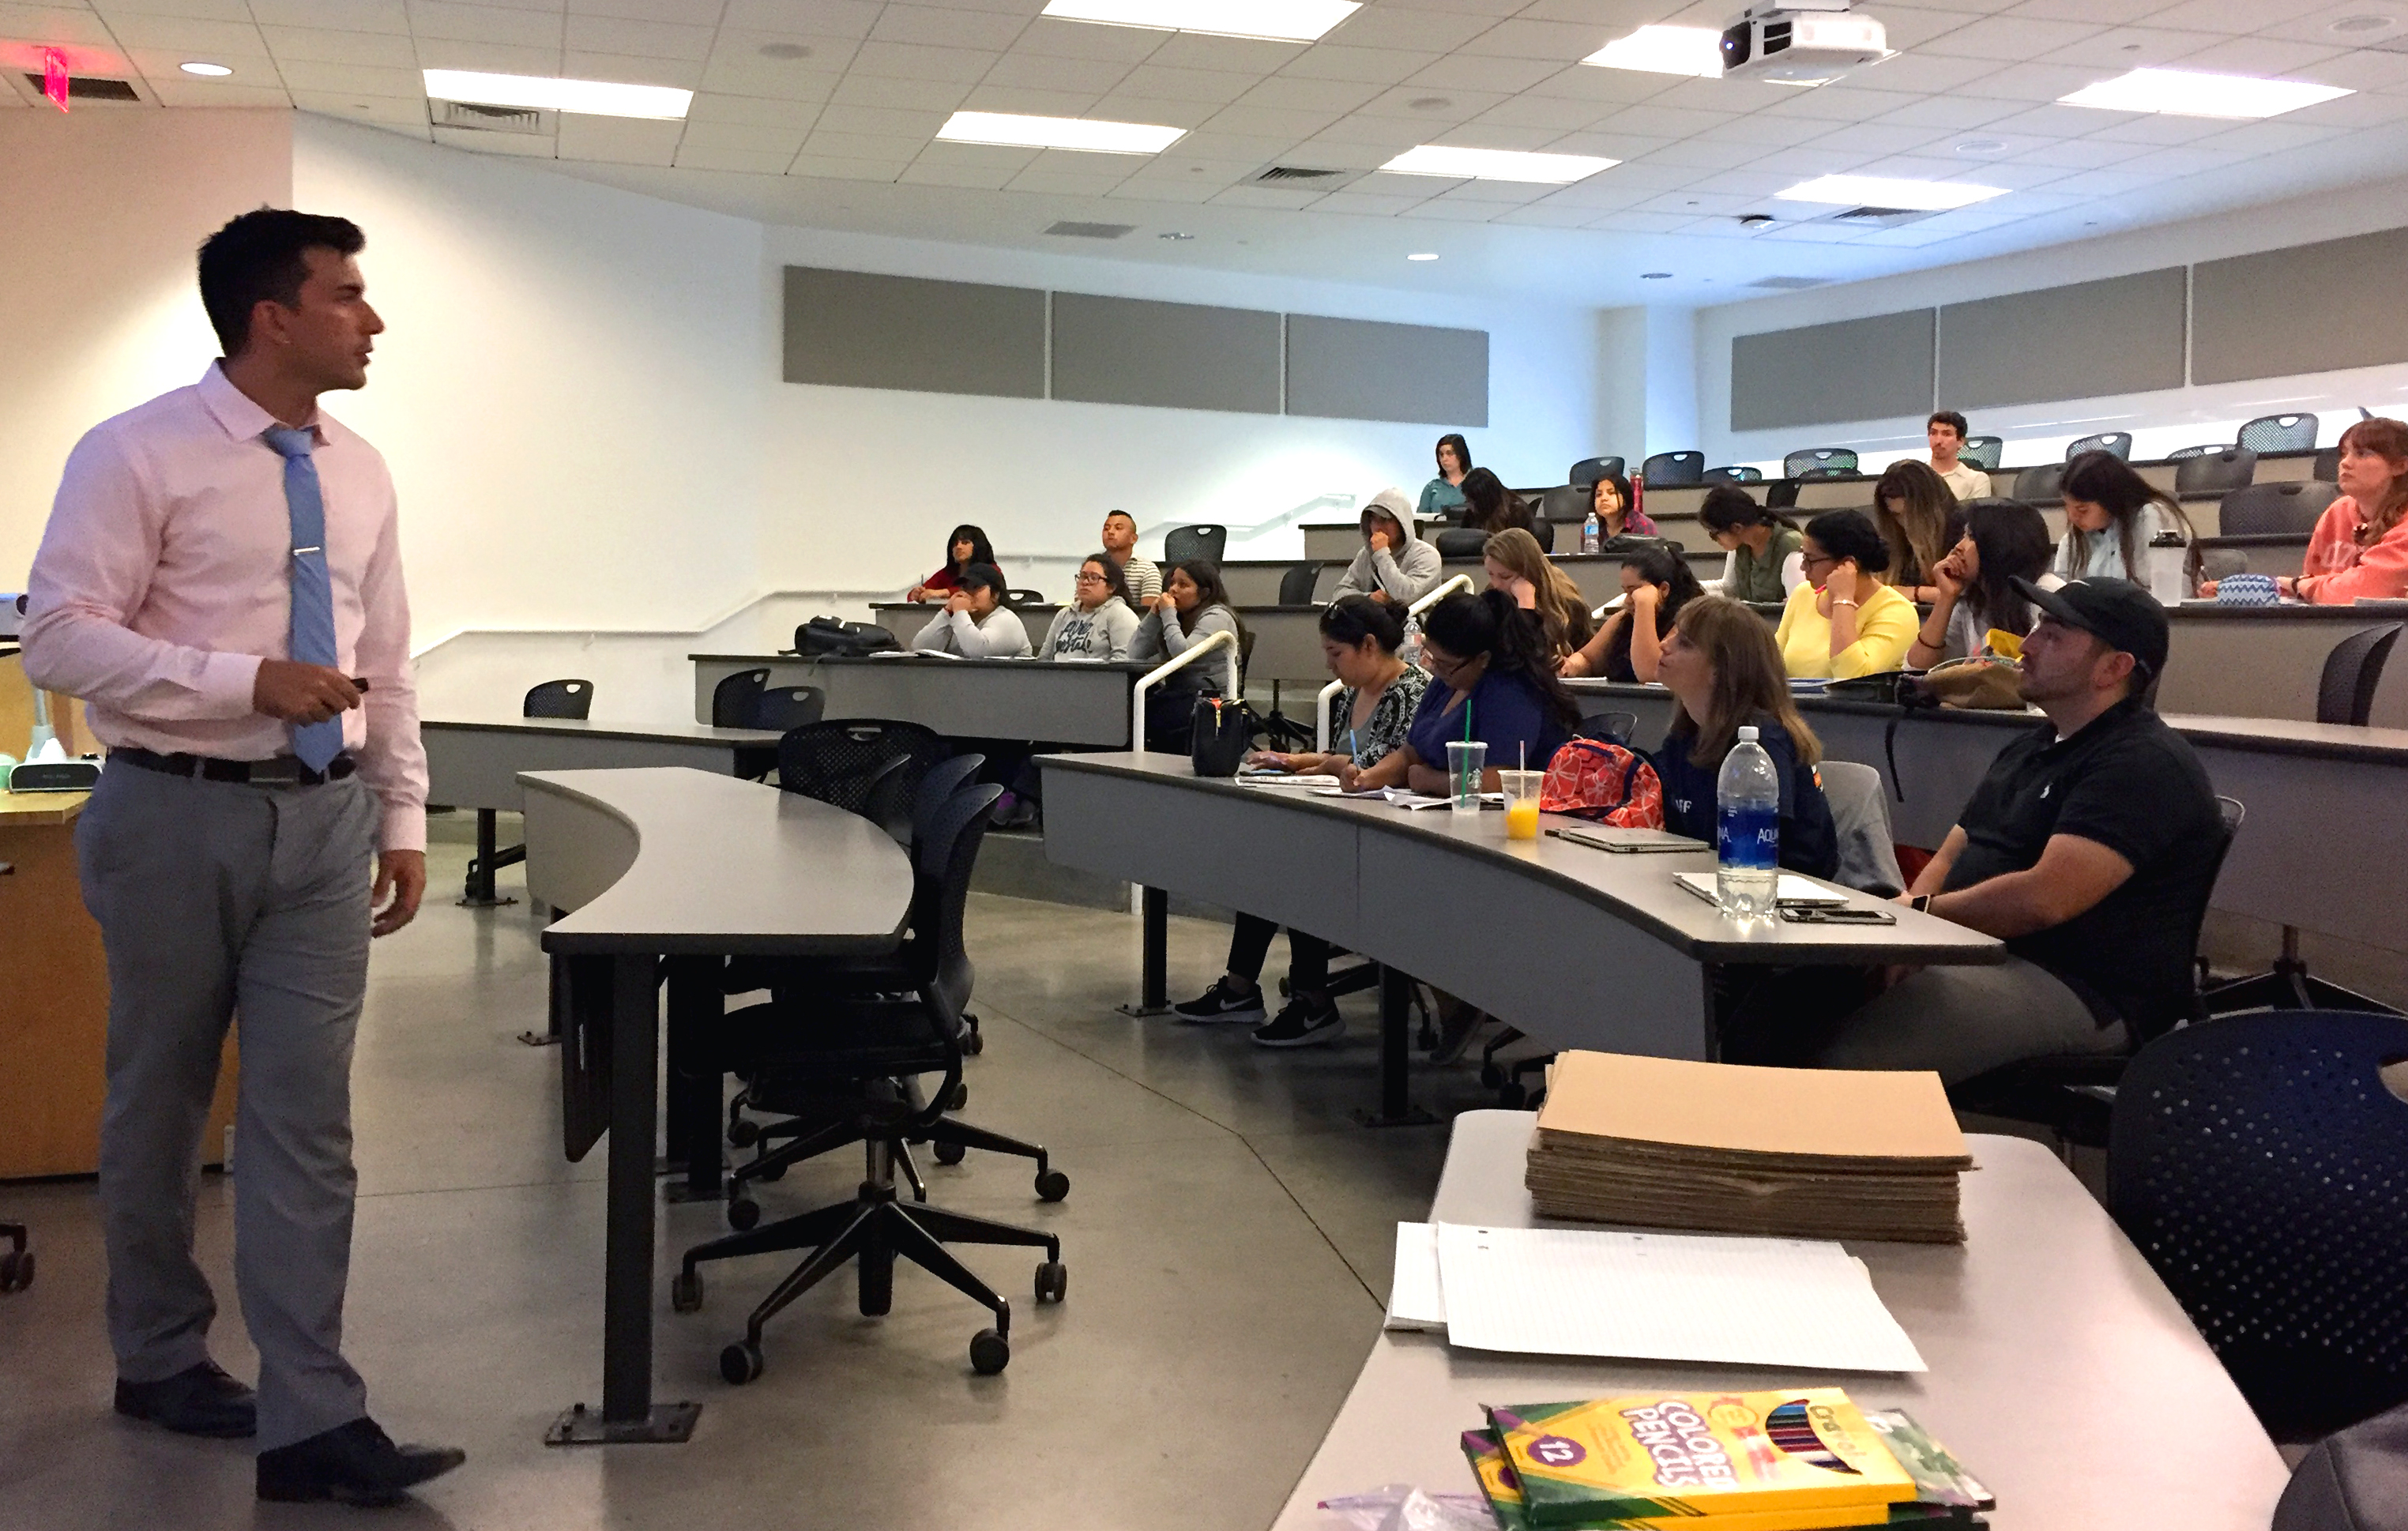 JPL's EPDC Coordinator, Brandon Rodriguez, leads an educator workshop